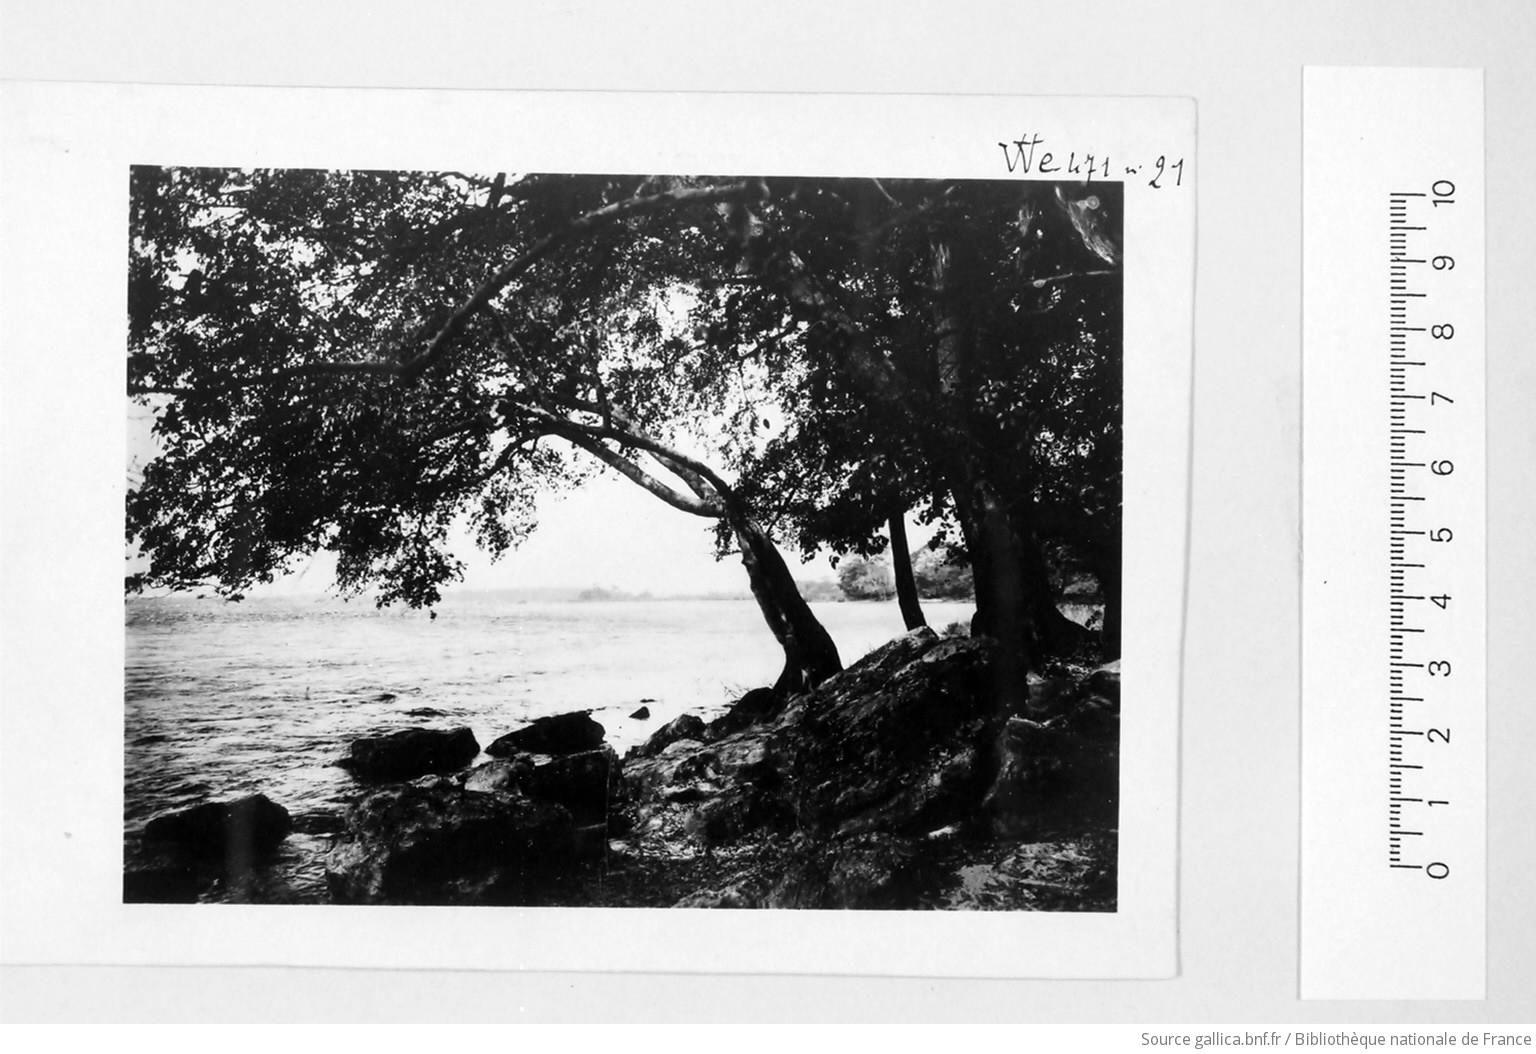 [39 phot. d'A.E.F. en 1924. Enregistré en 1936] - 21